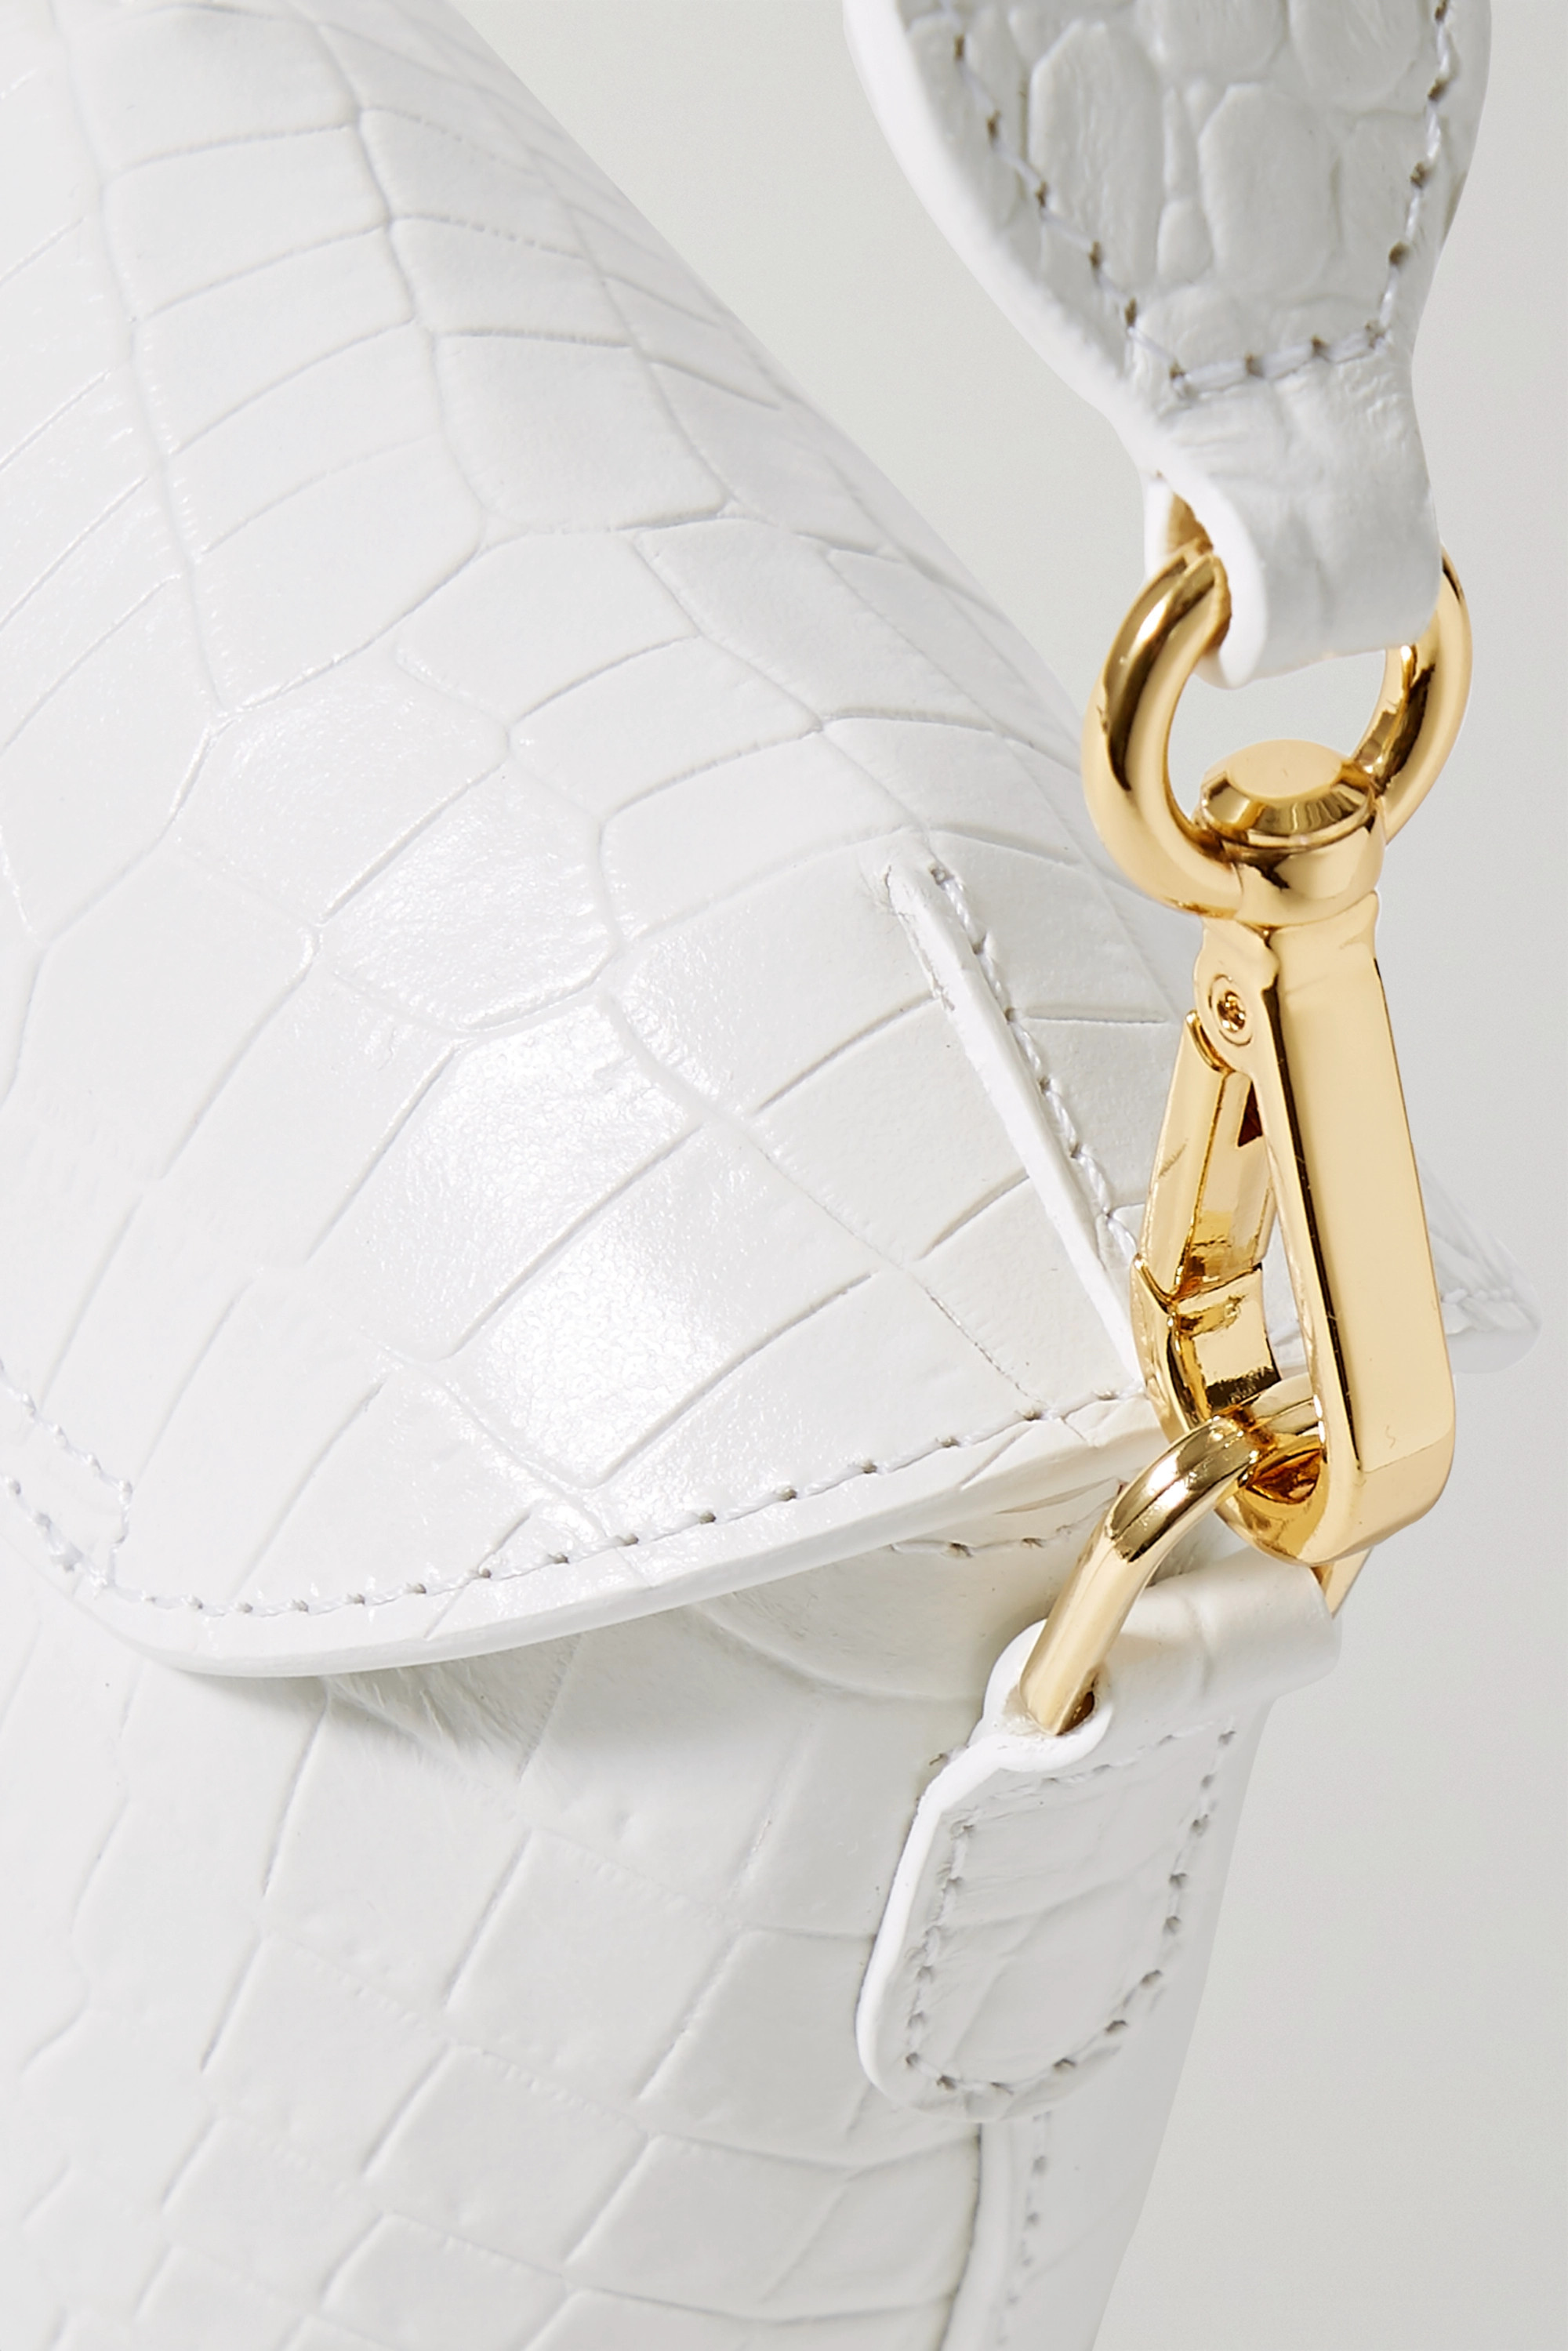 S.Joon Milk Pail mini croc-effect leather tote